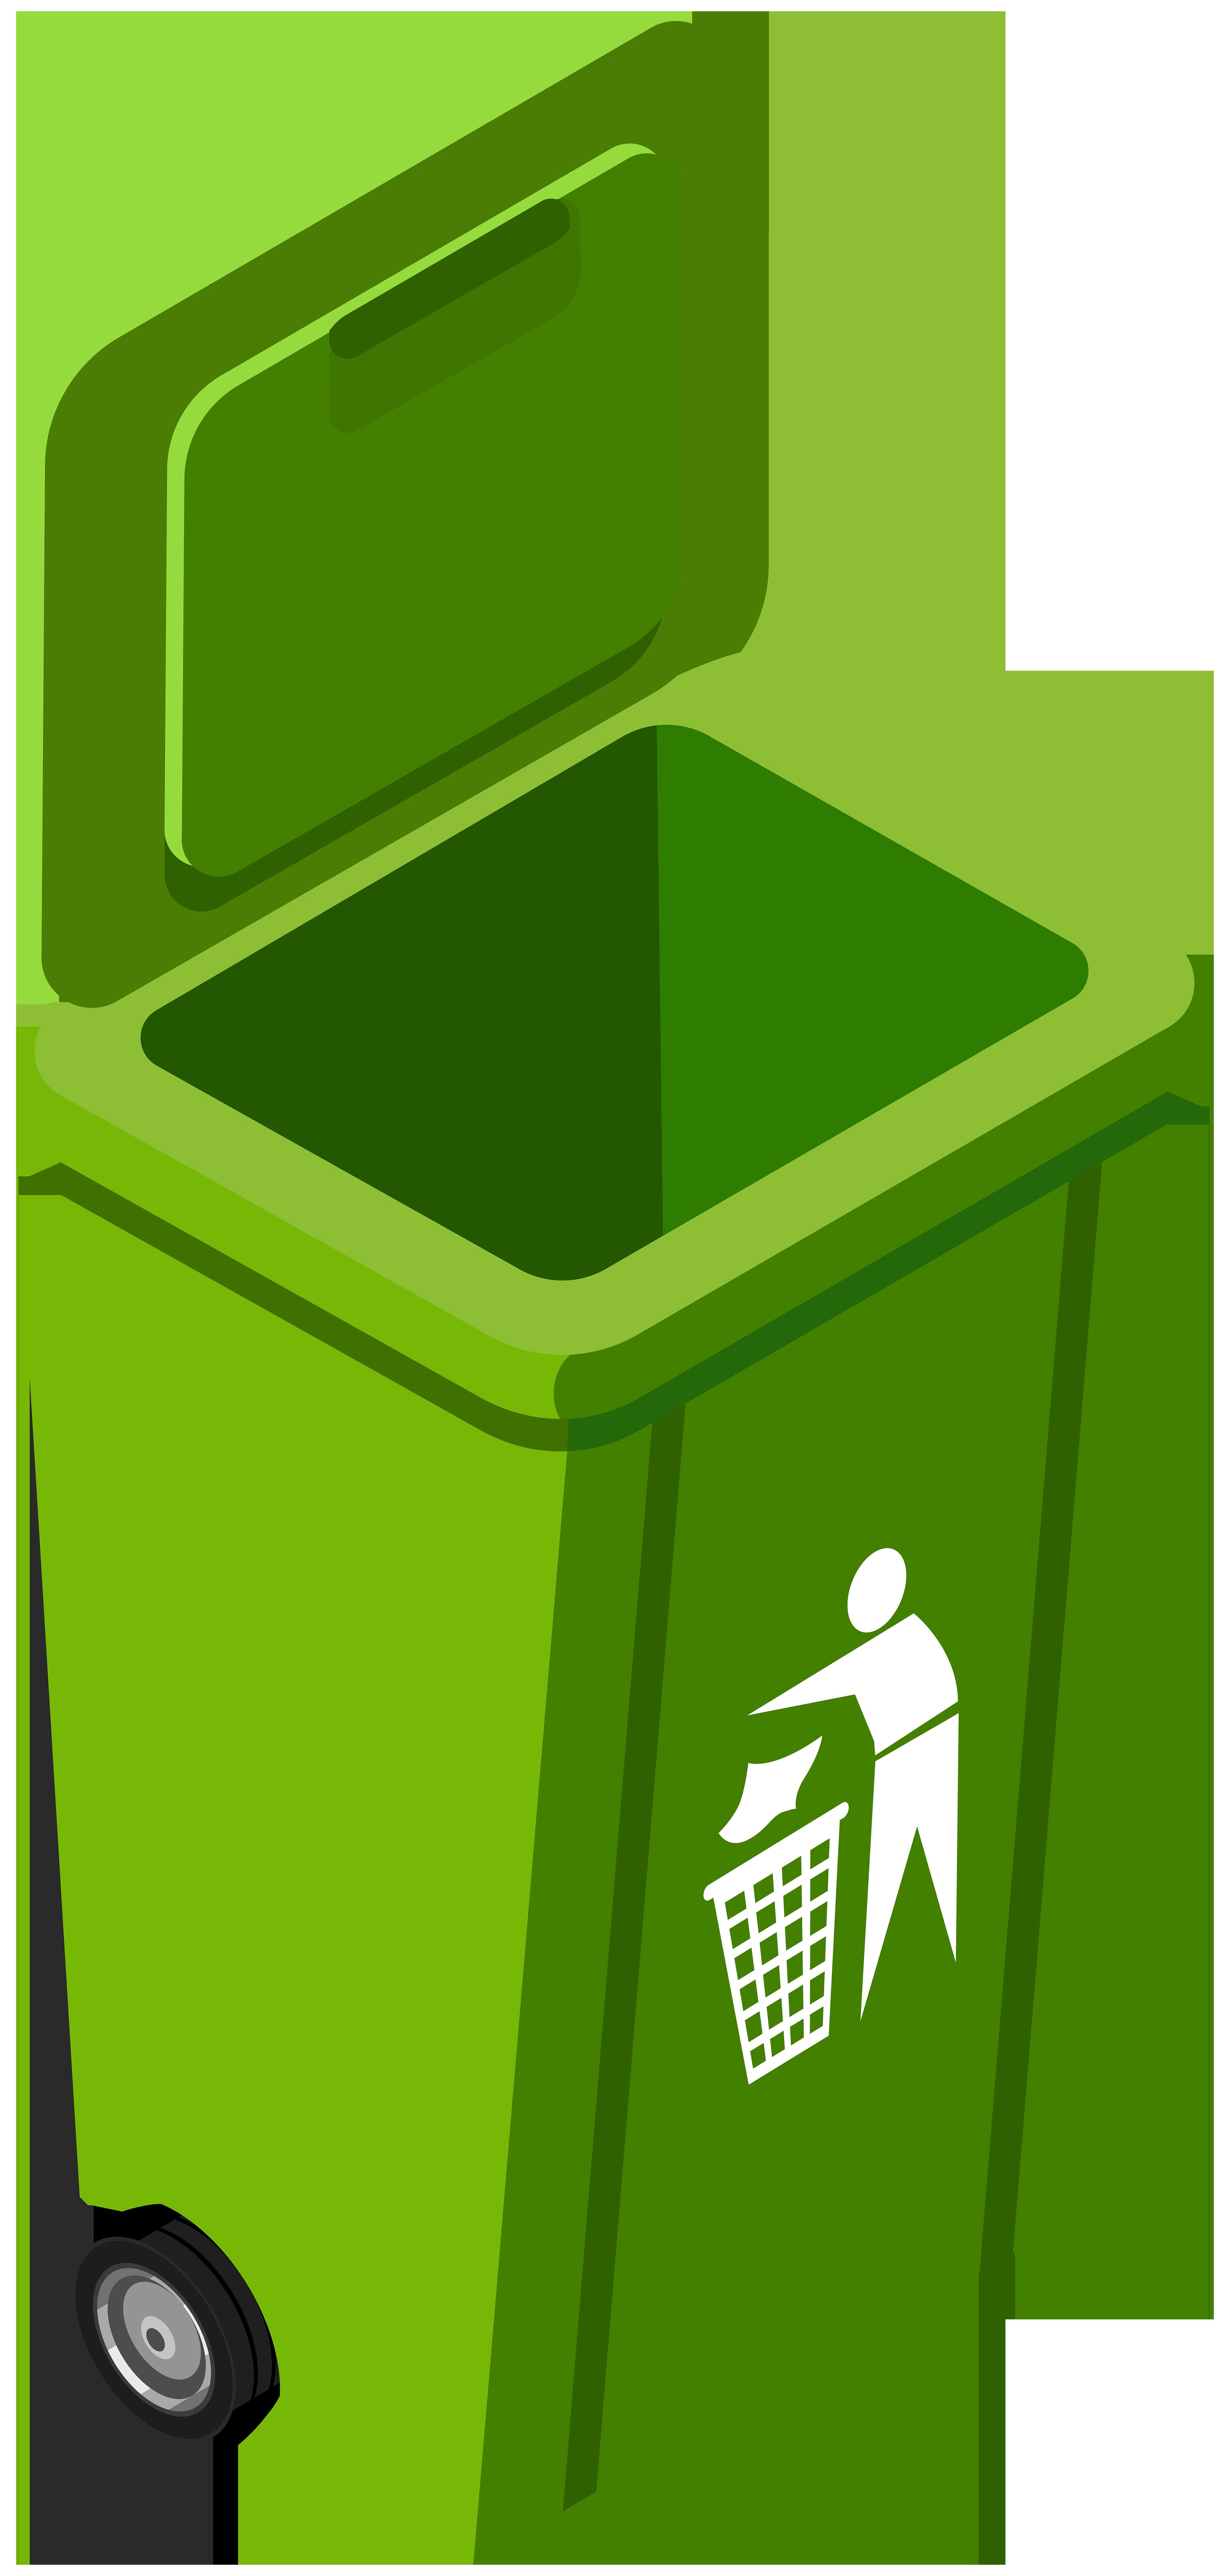 Trash Can Clipart at GetDrawings.com.